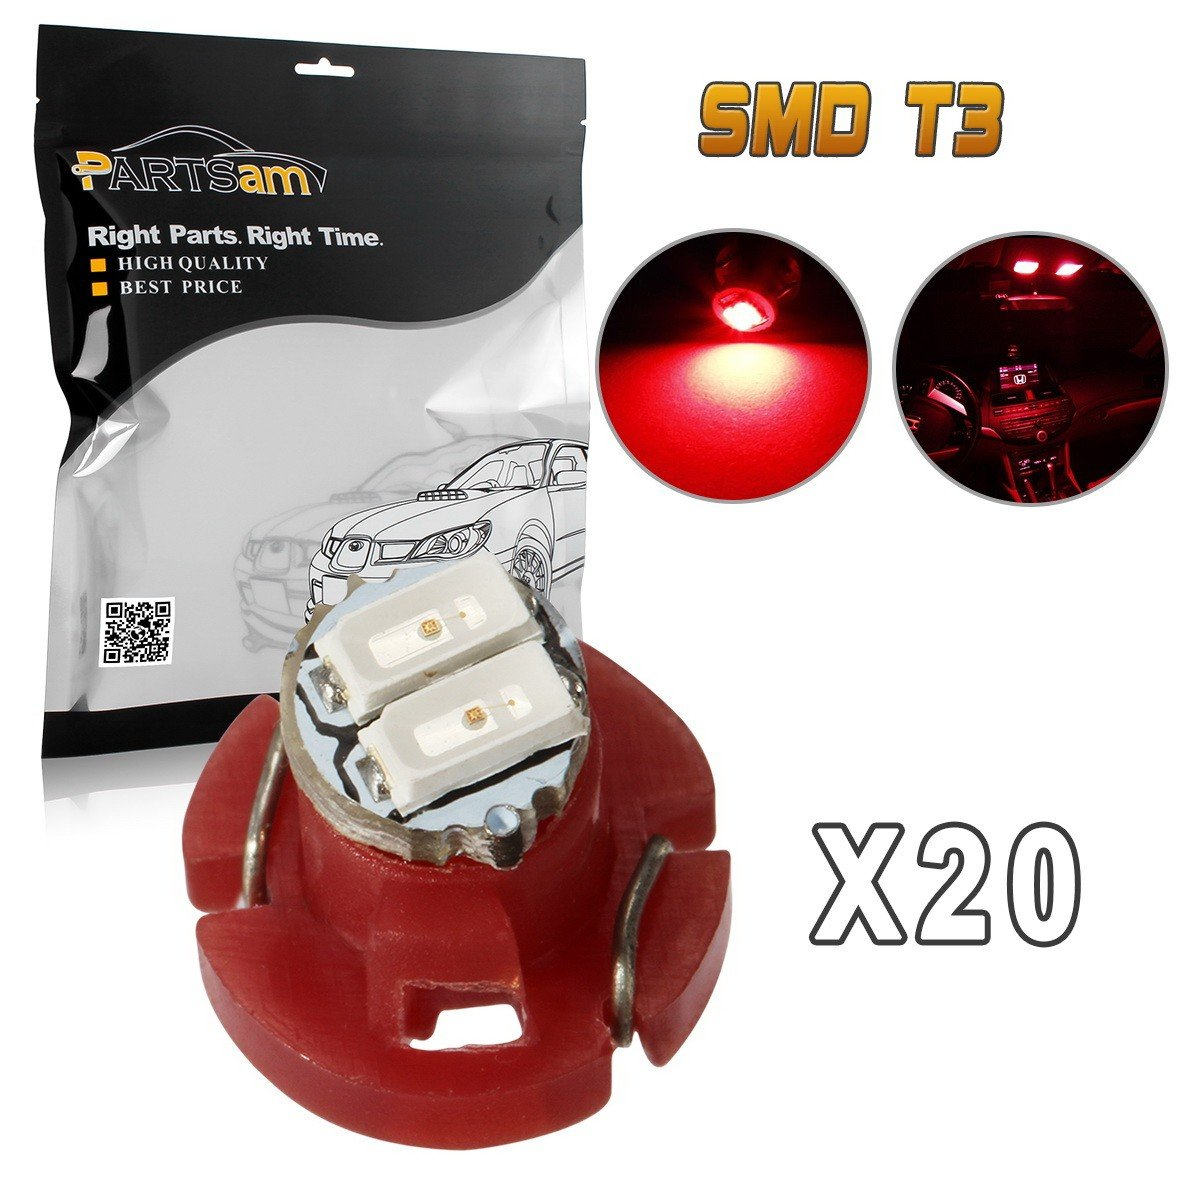 Partsam 20Pcs 4.7mm Grain Of Wheat Mini Halogen Bulbs Instrument Cluster Panel Backlight Gauge Lights 12V 95ma